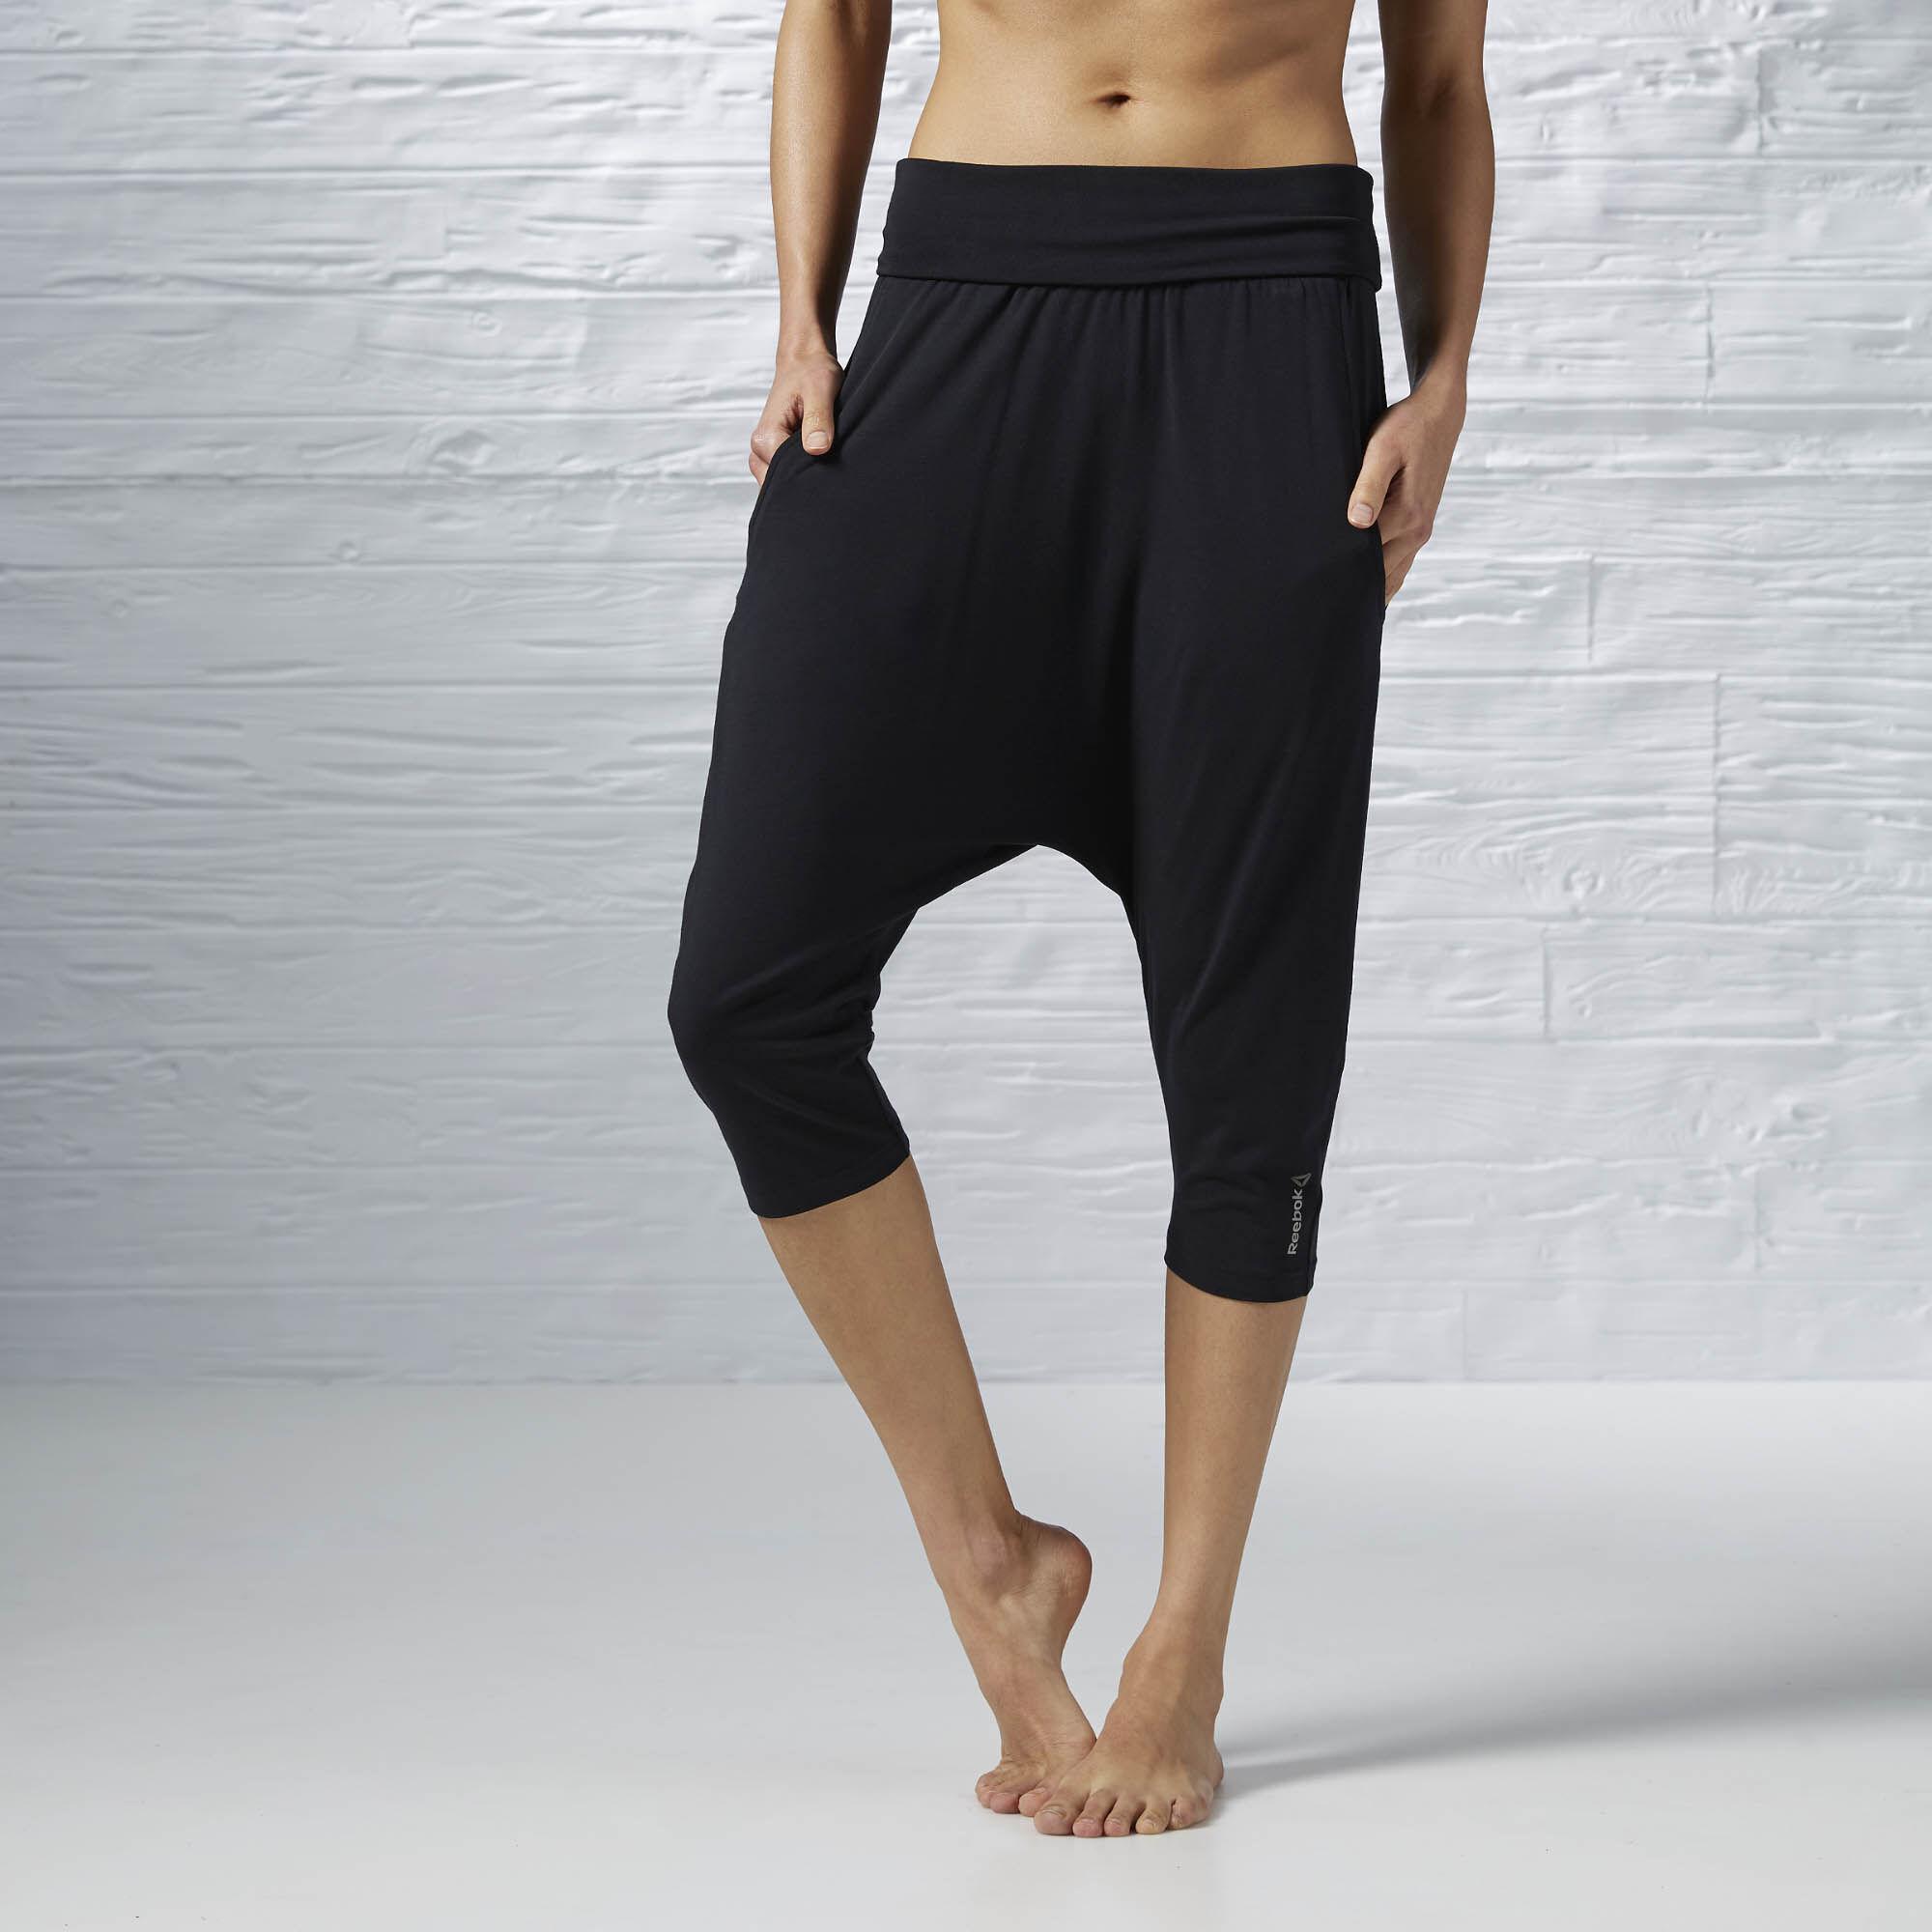 Sport Pantalons Noir France Noir Pantalons Reebok Sport HqPxT6